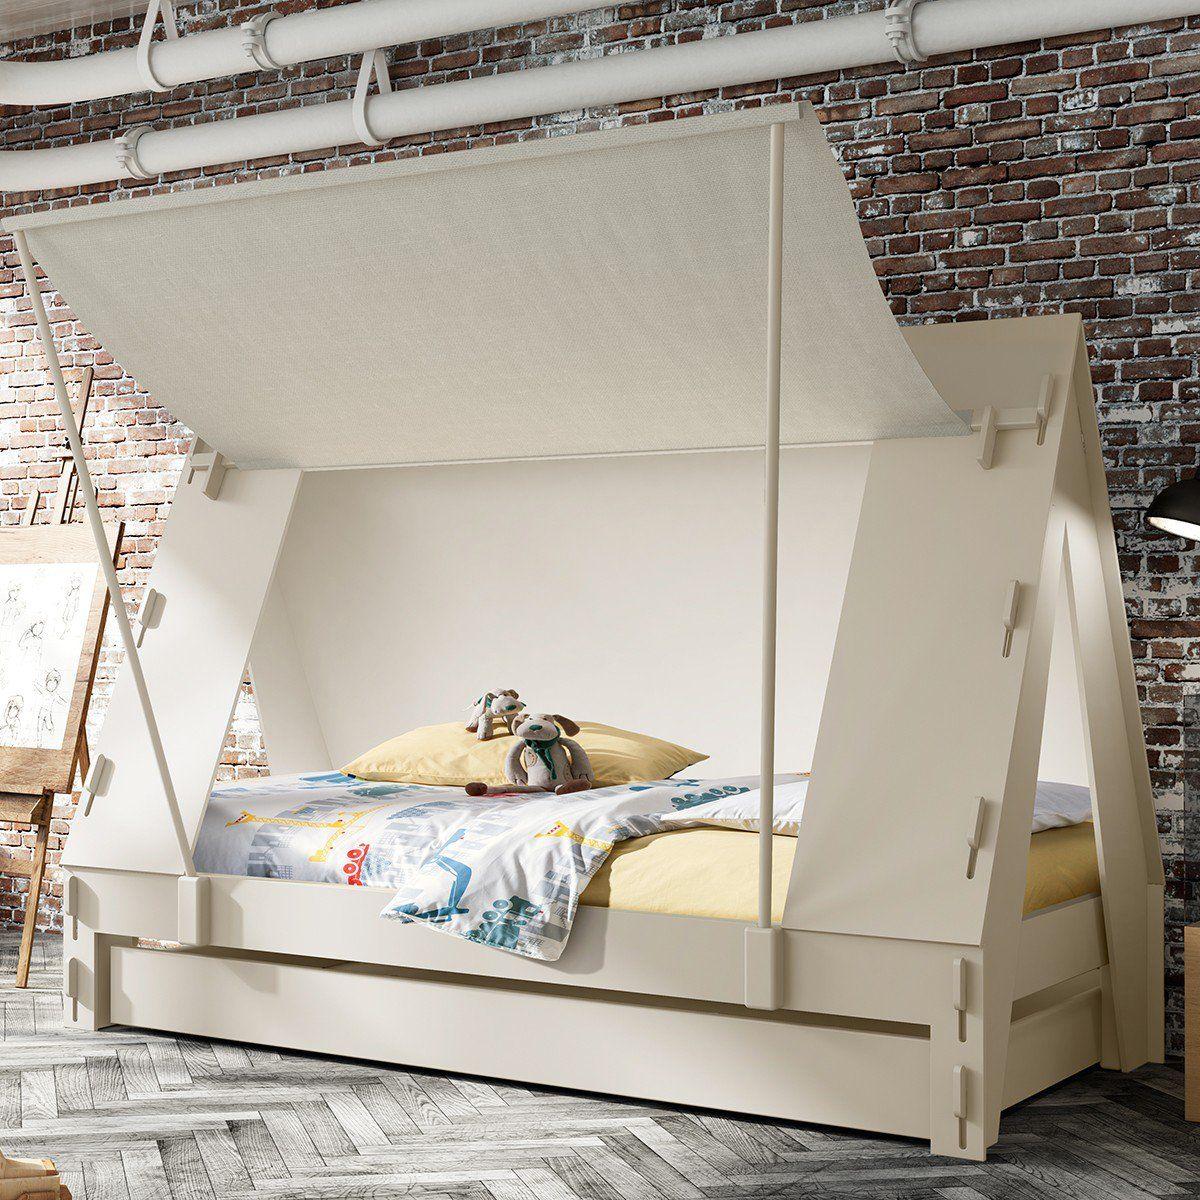 un lit cabane blanc pour enfant inspiration scandinave. Black Bedroom Furniture Sets. Home Design Ideas